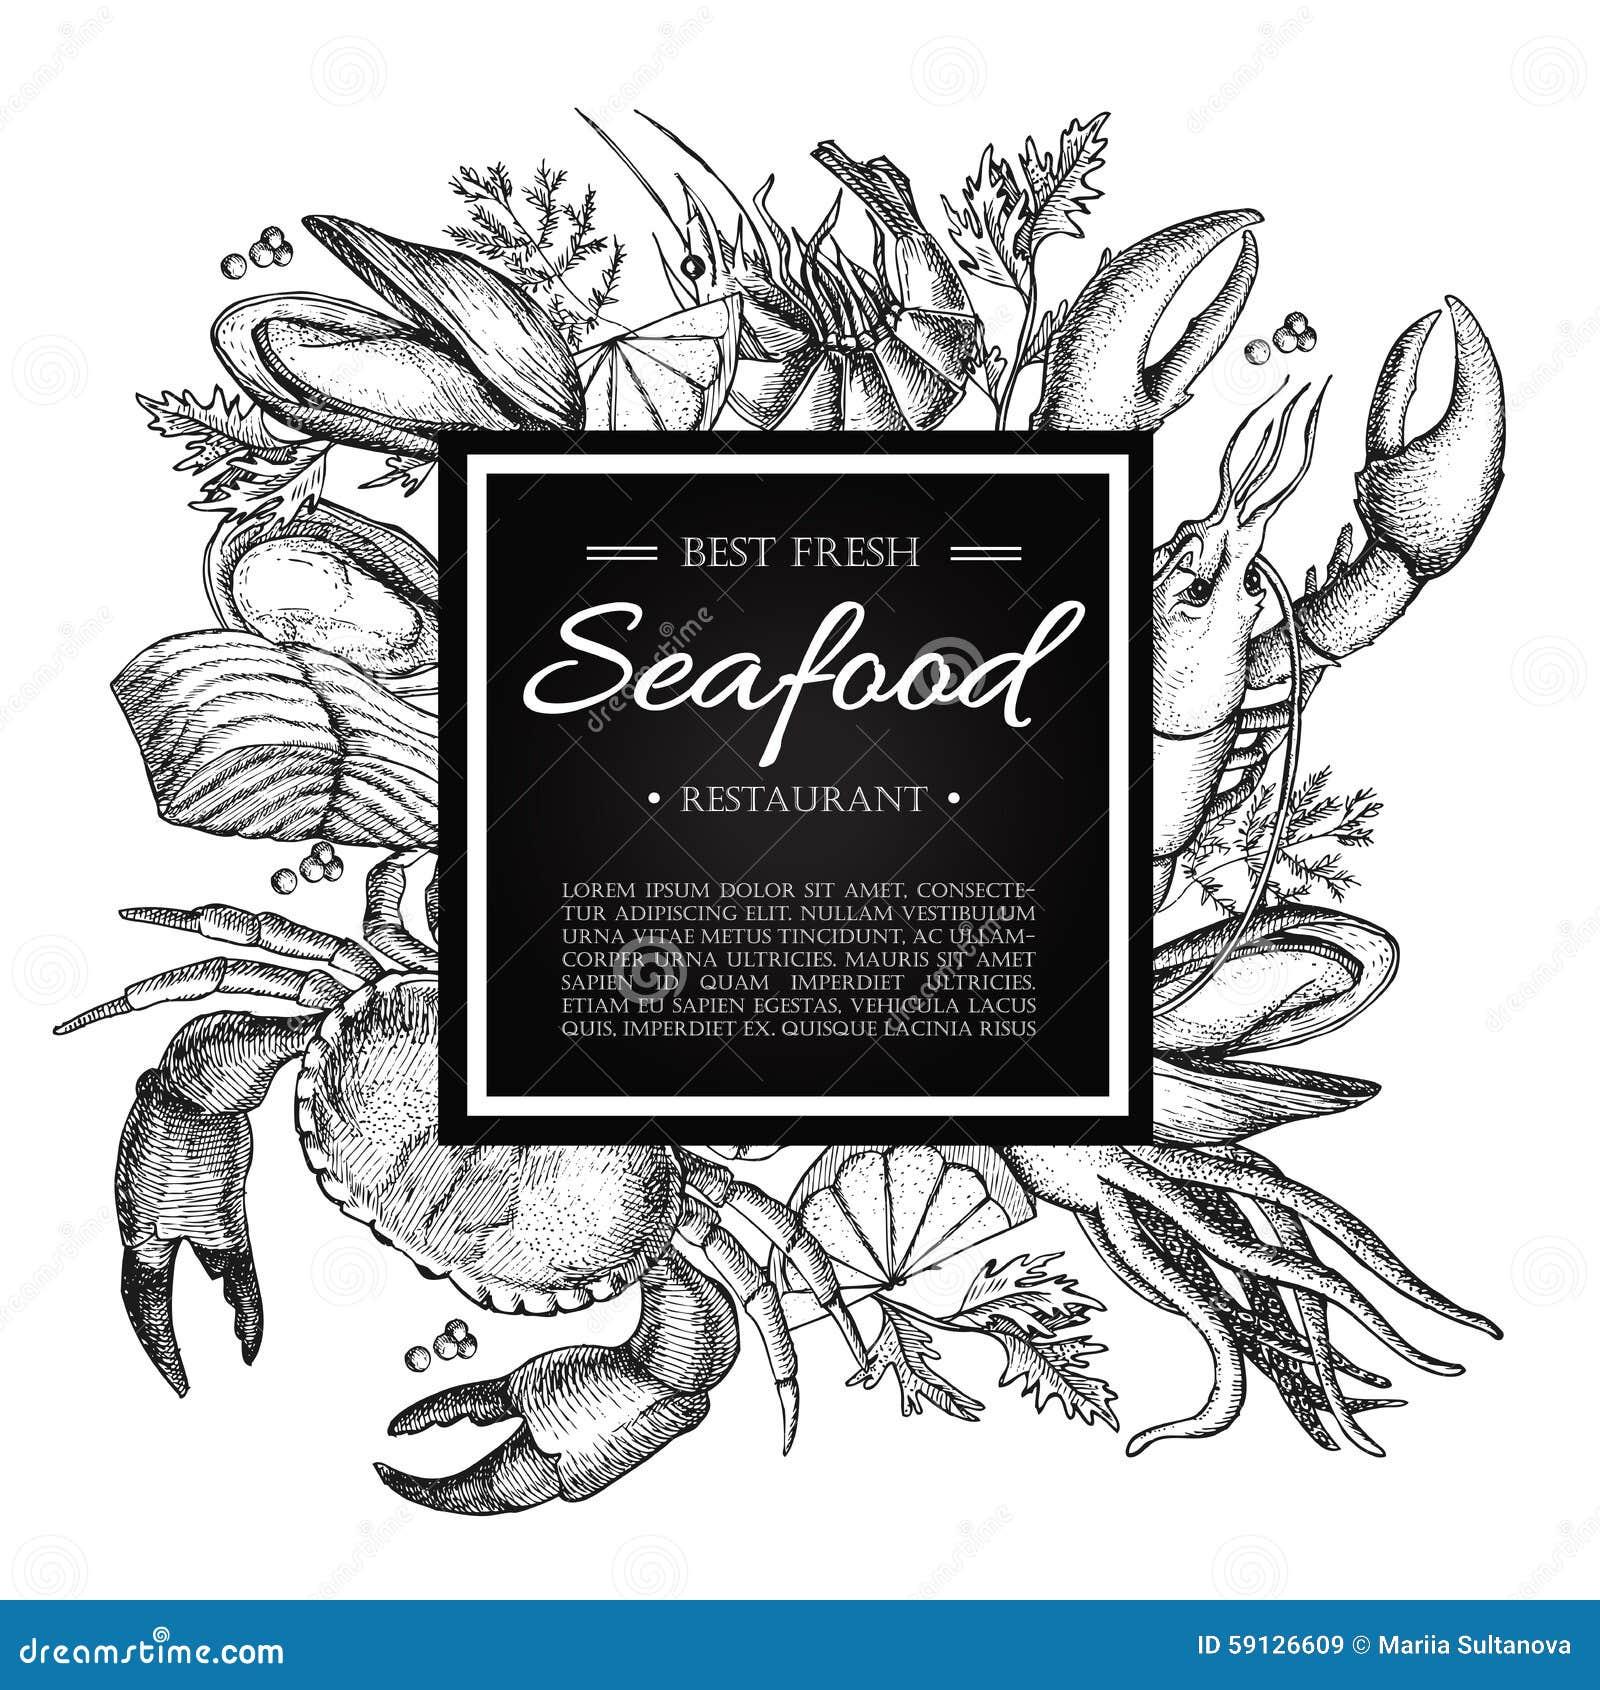 Vintage Steak and Seafood Restaurant - 76 Photos &